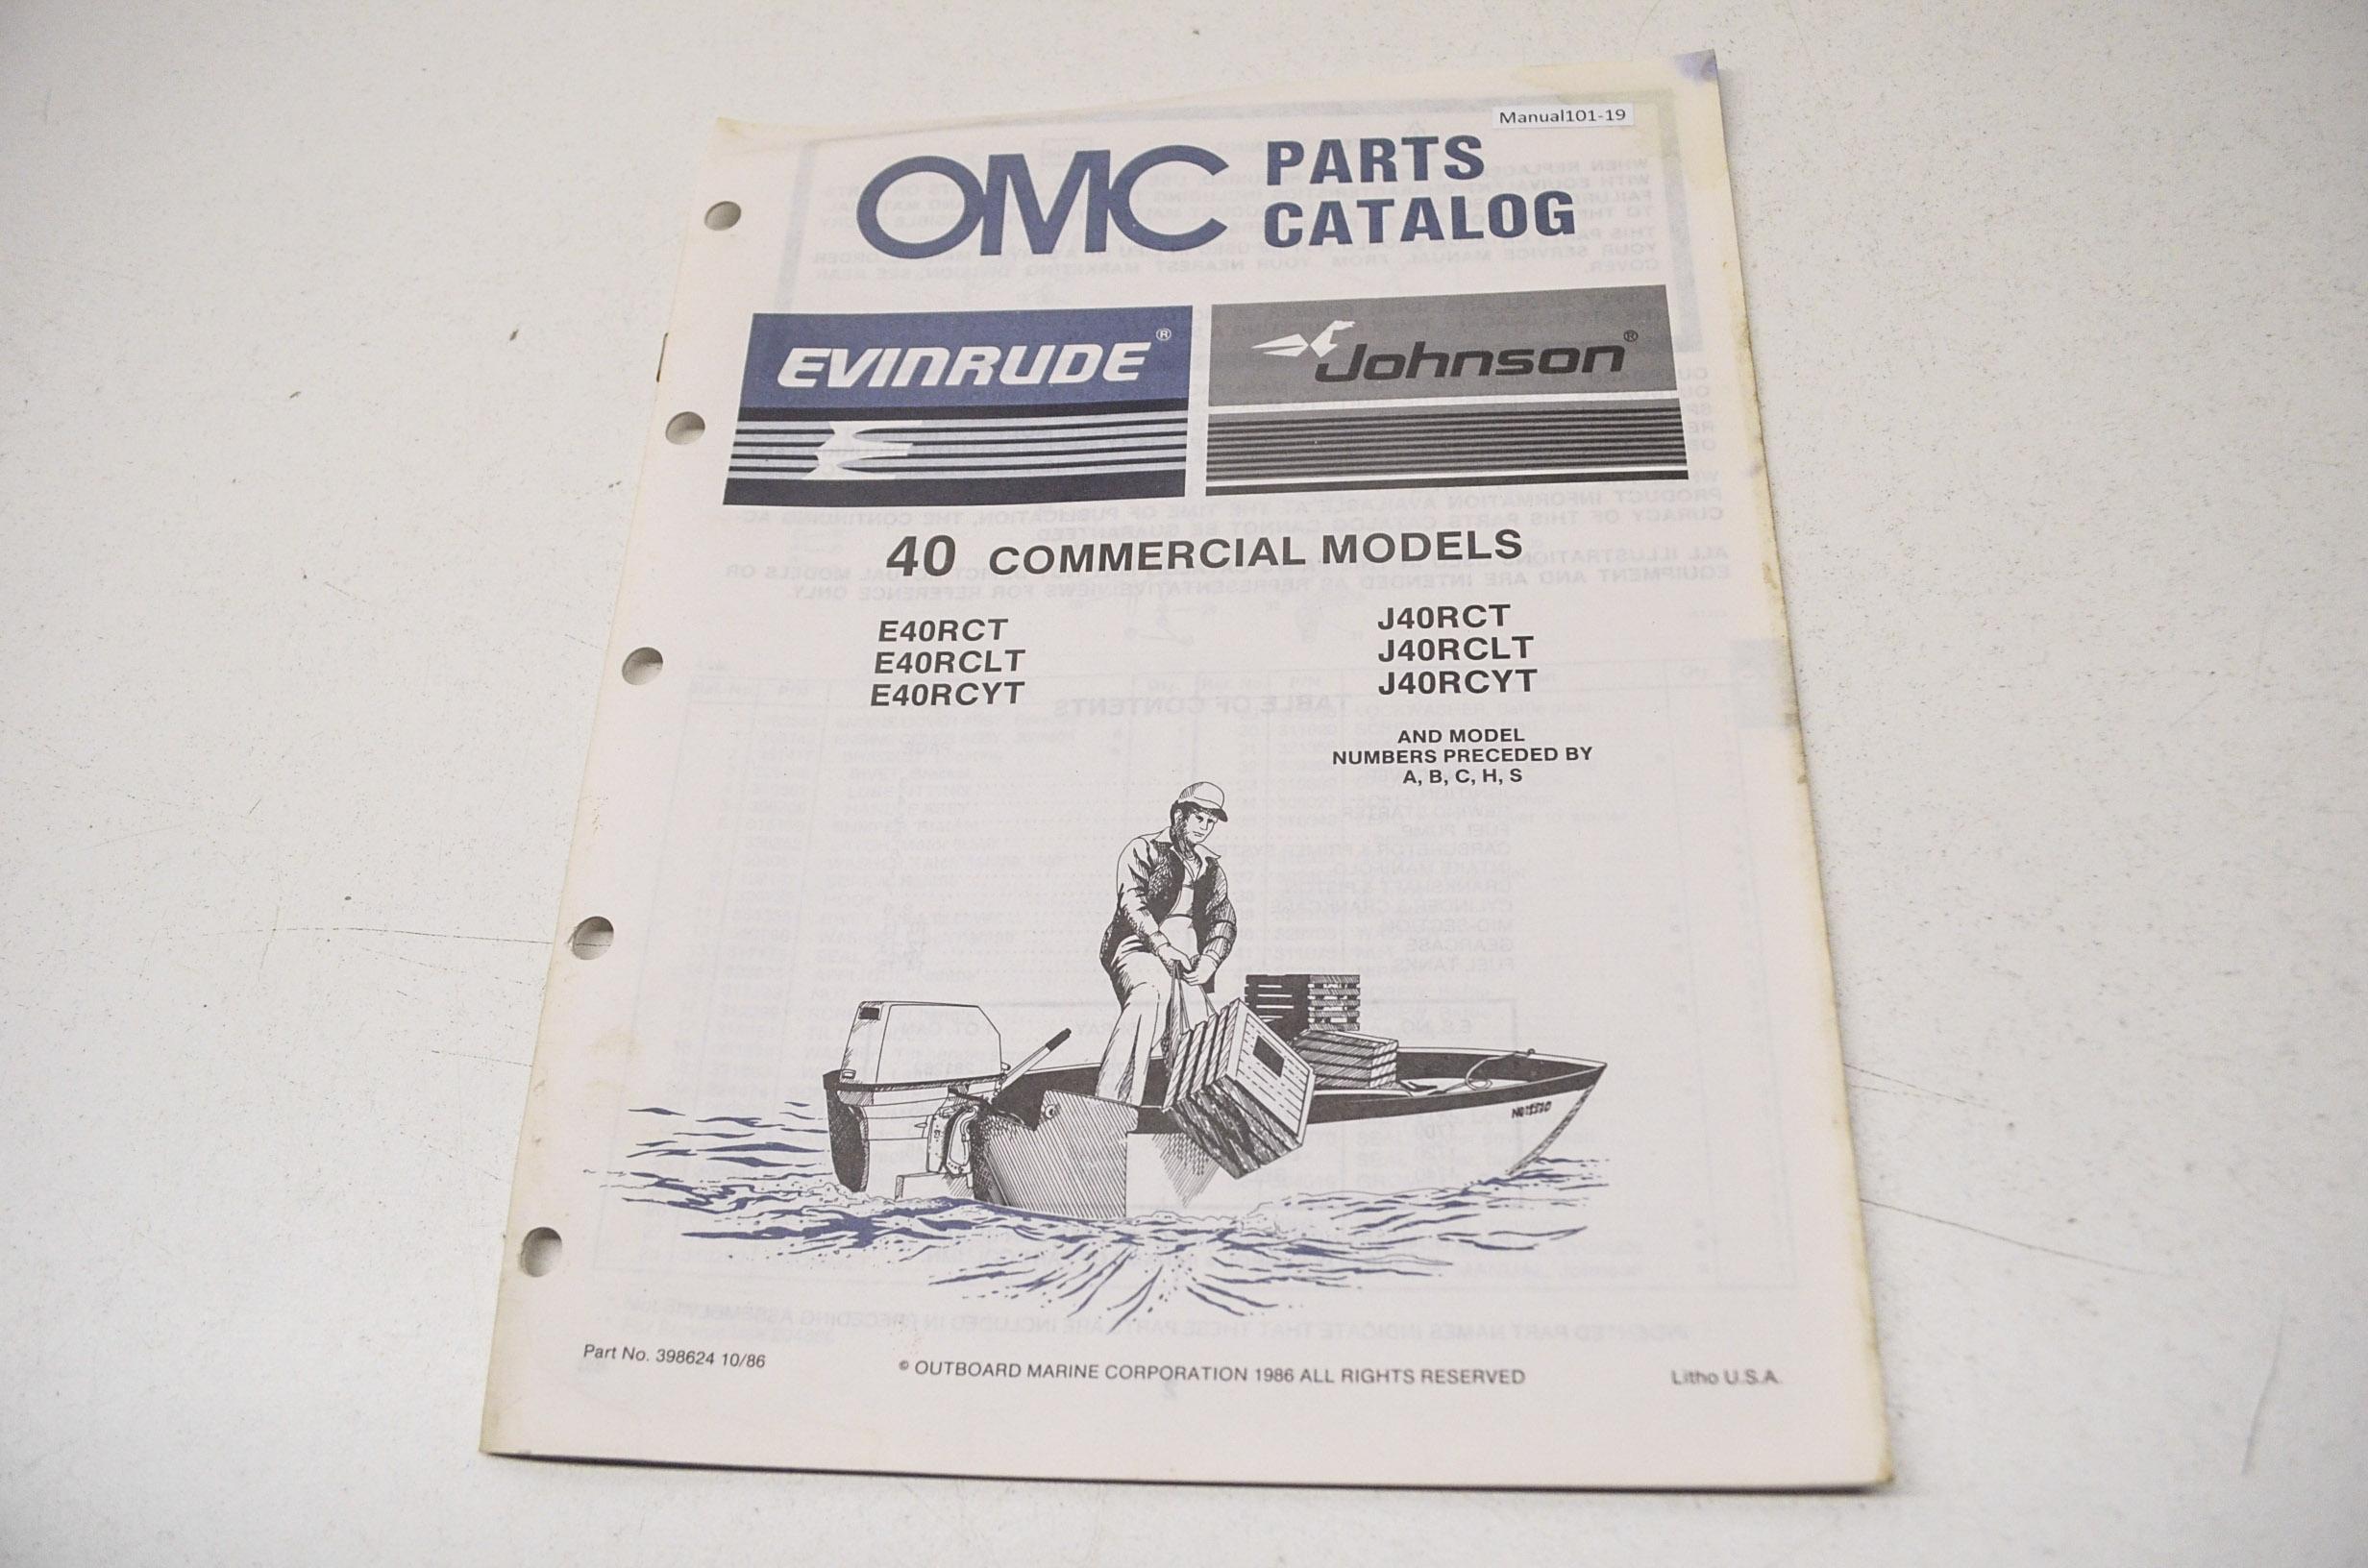 OMC 398624 Parts Catalog 40 Commercial Models QTY 1